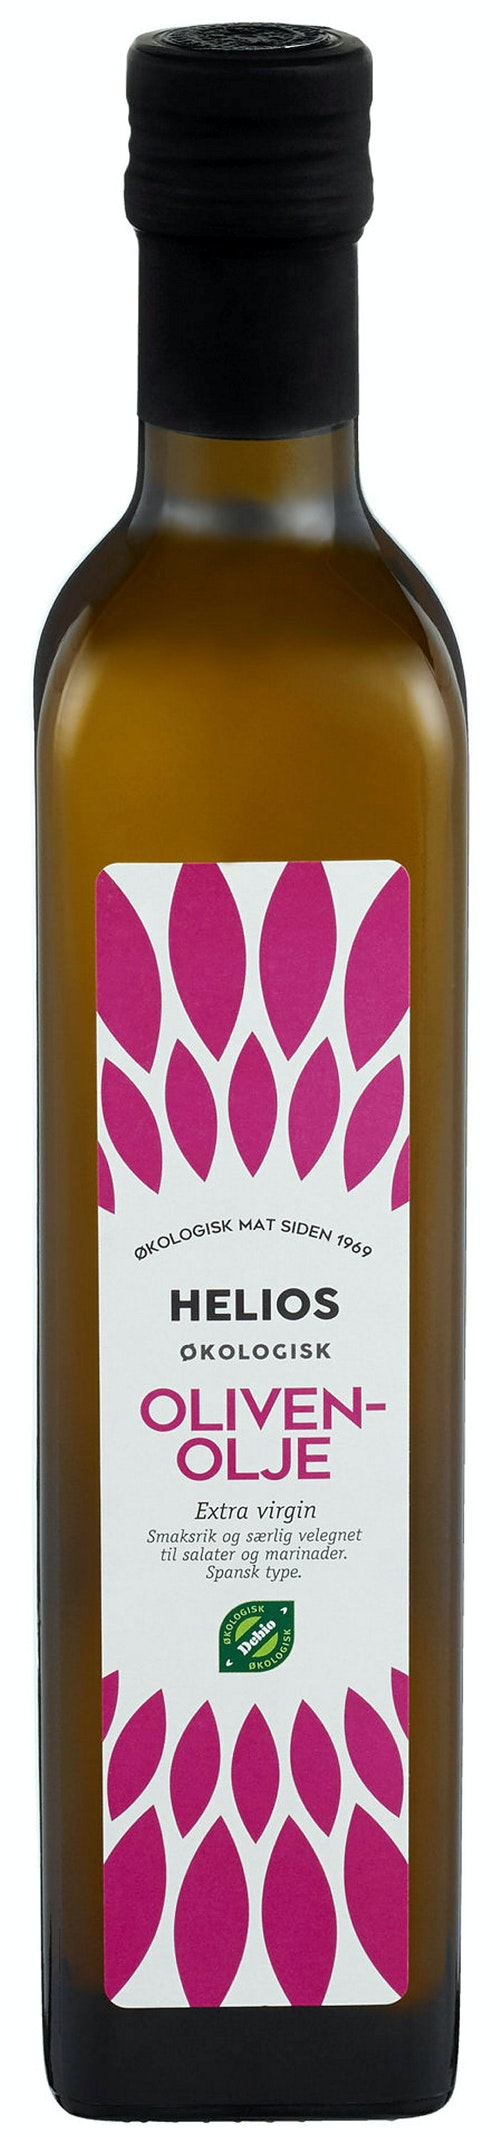 Helios Olivenolje Spansk Extra Virgin Økologisk, kaldpresset, 0,5 l